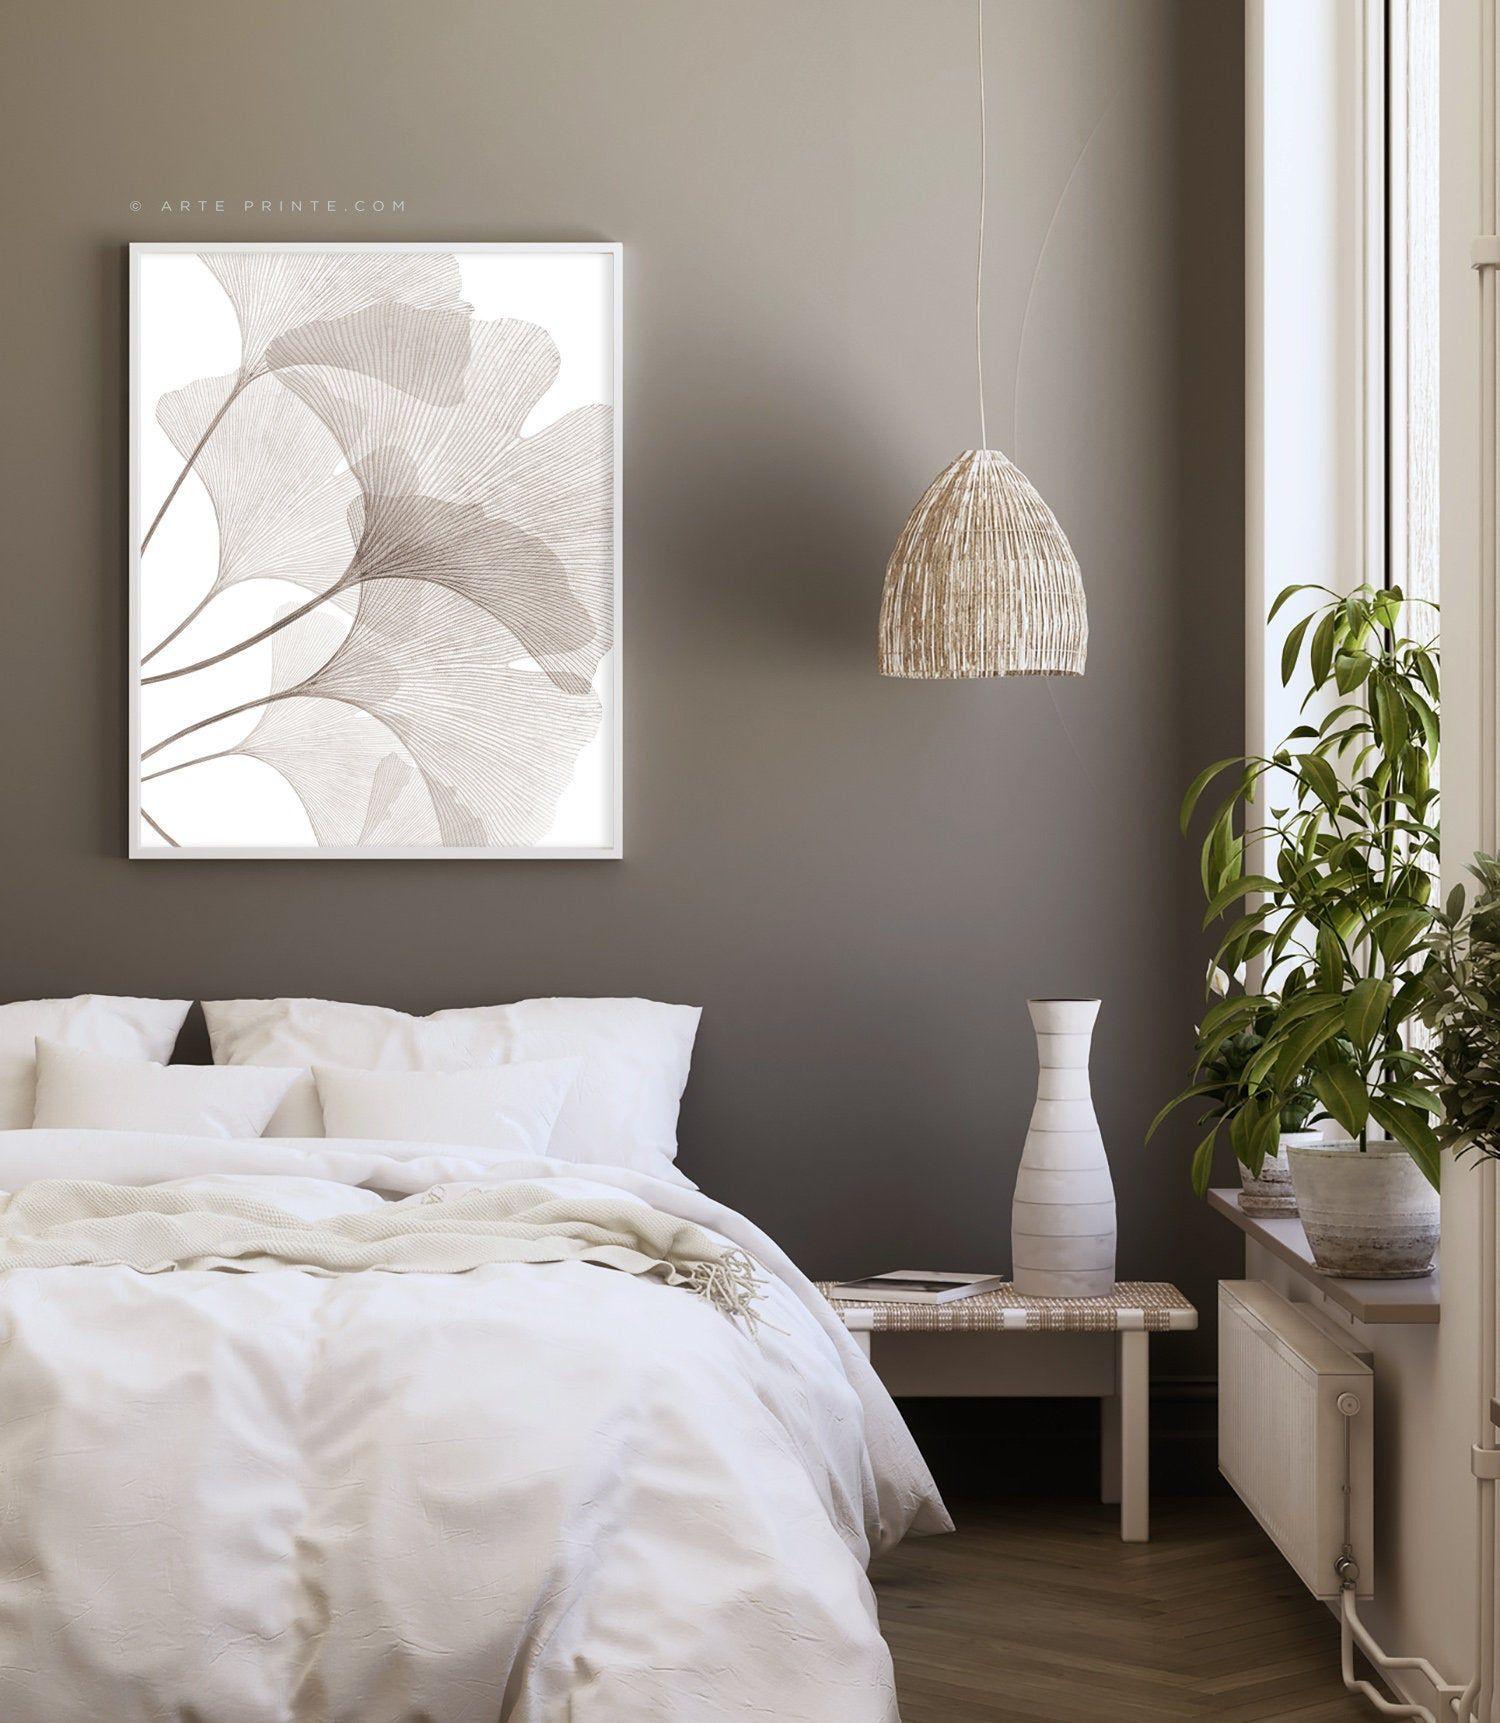 Ginkgo Leaf Print Brown Taupe Wall Art Modern Botanical Print Transparent Ginko Leaves Printable Poster Bedroom Wall Decor Digital Download In 2020 Brown Bedroom Walls Taupe Walls Wall Decor Bedroom